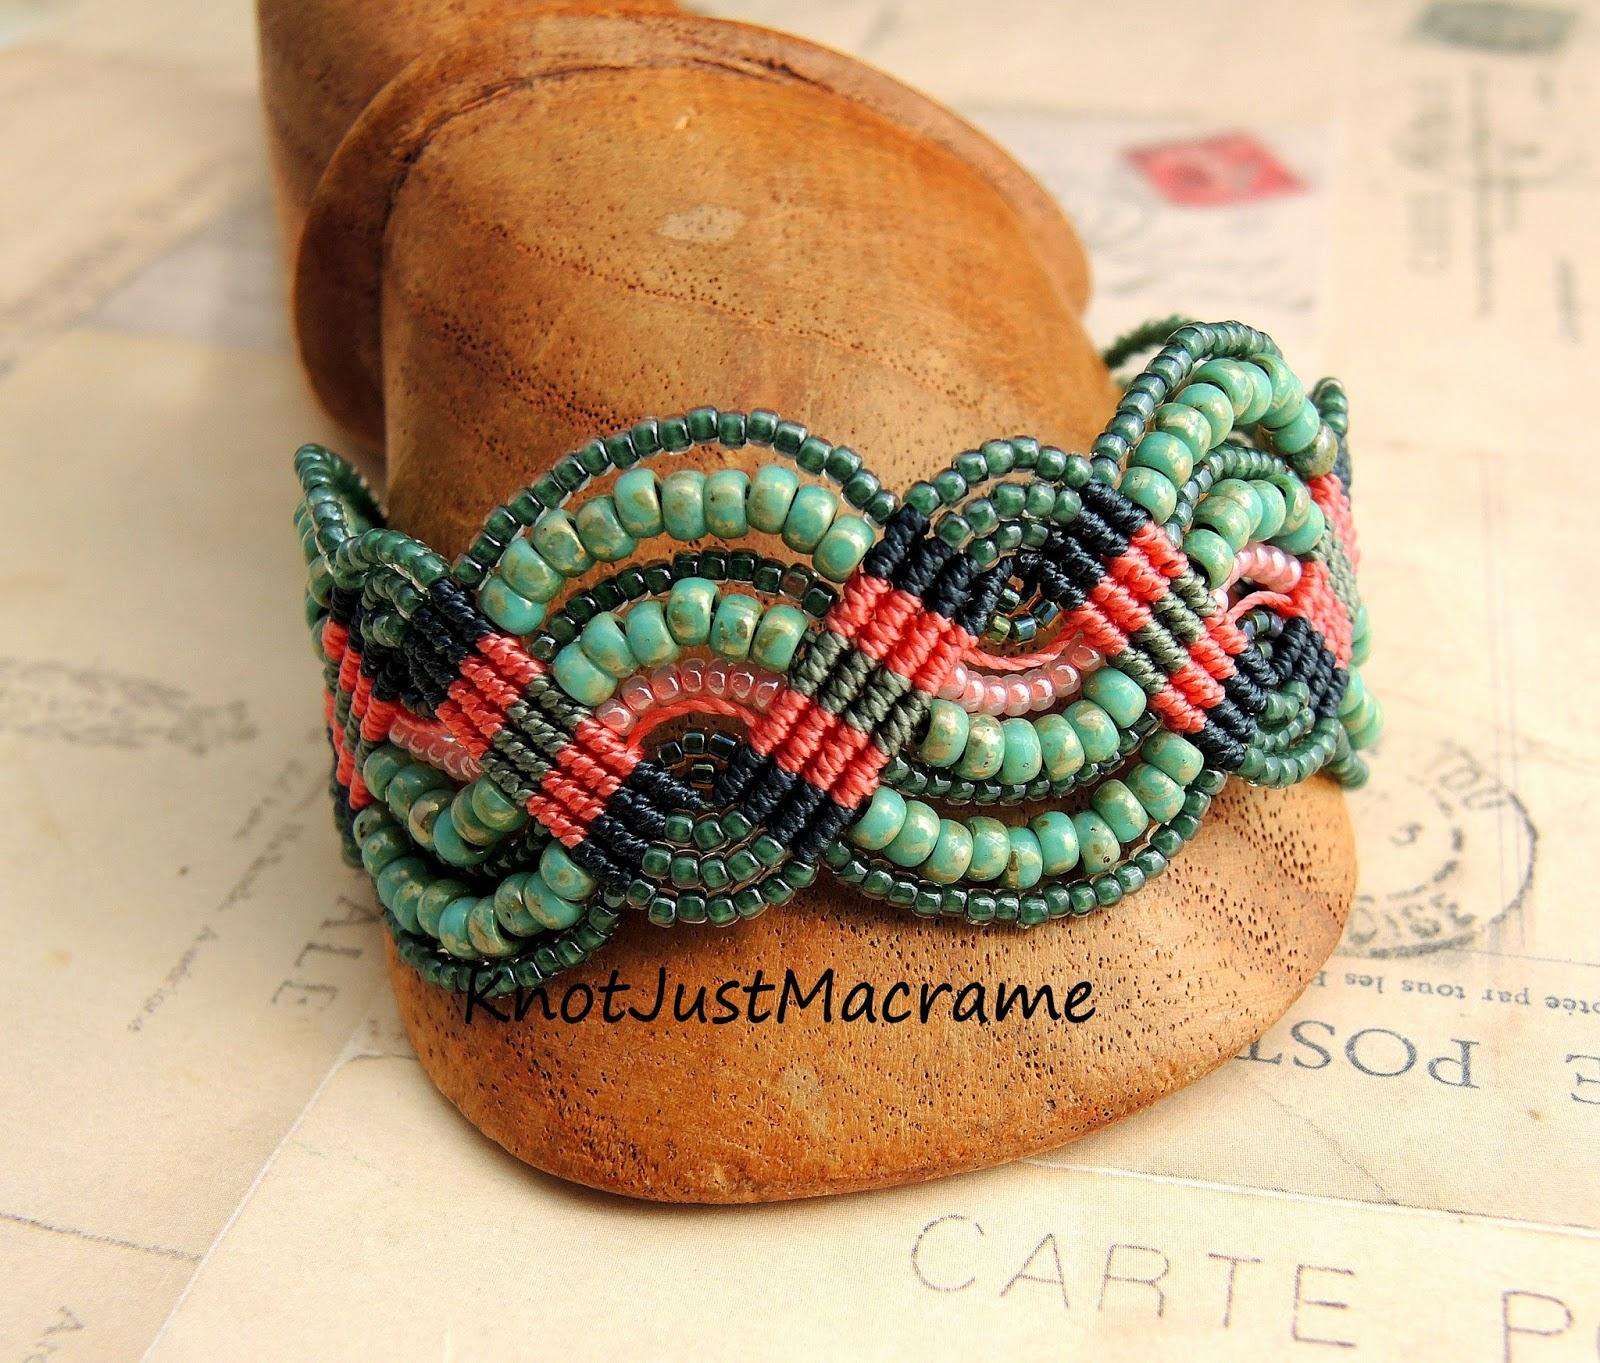 Matubo beads in Micro Macrame bracelet by Sherri Stokey